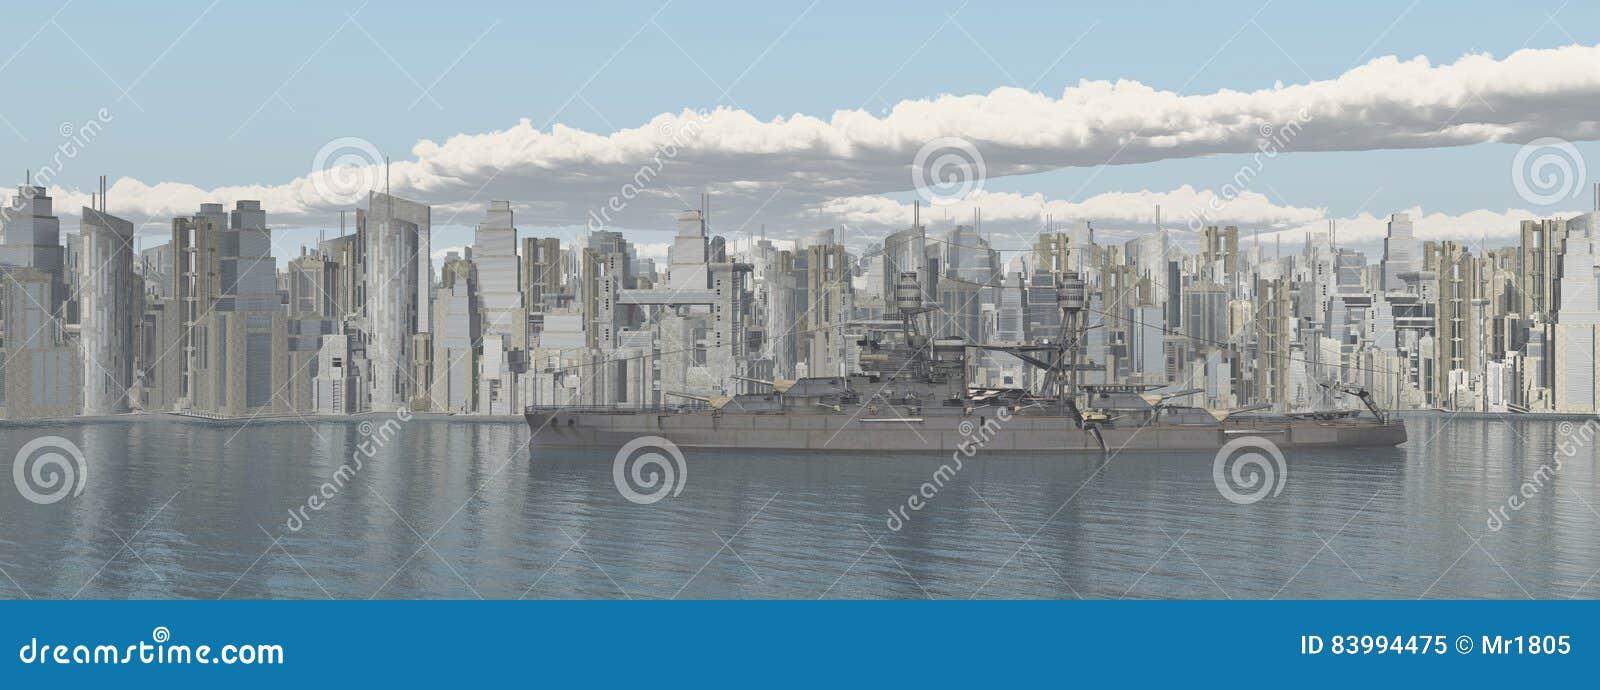 Seaside city and American warship from World War II